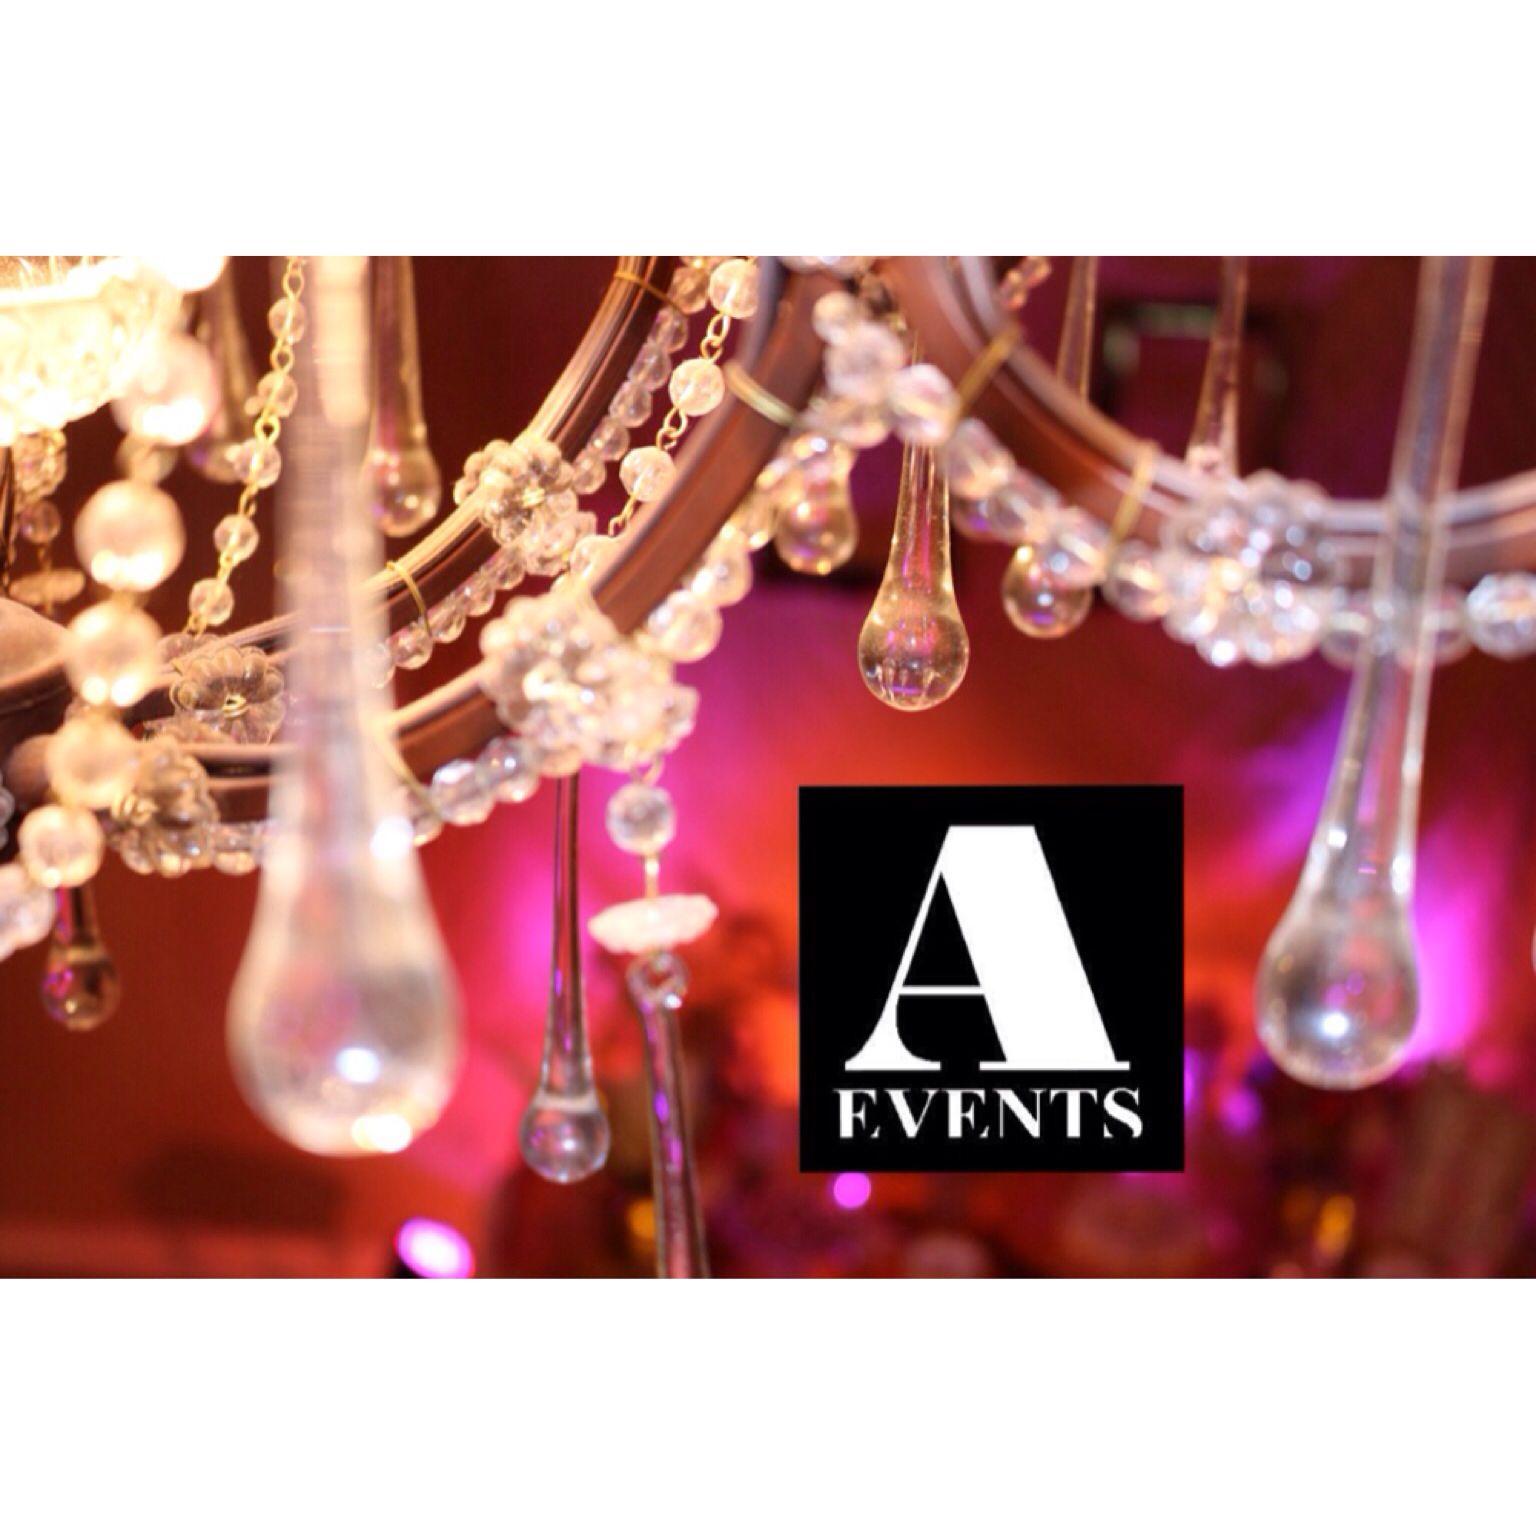 #sweet16 #chandelier #chandeliertheme #pink #gold #sparkle #glam #formal #intimate #aevent